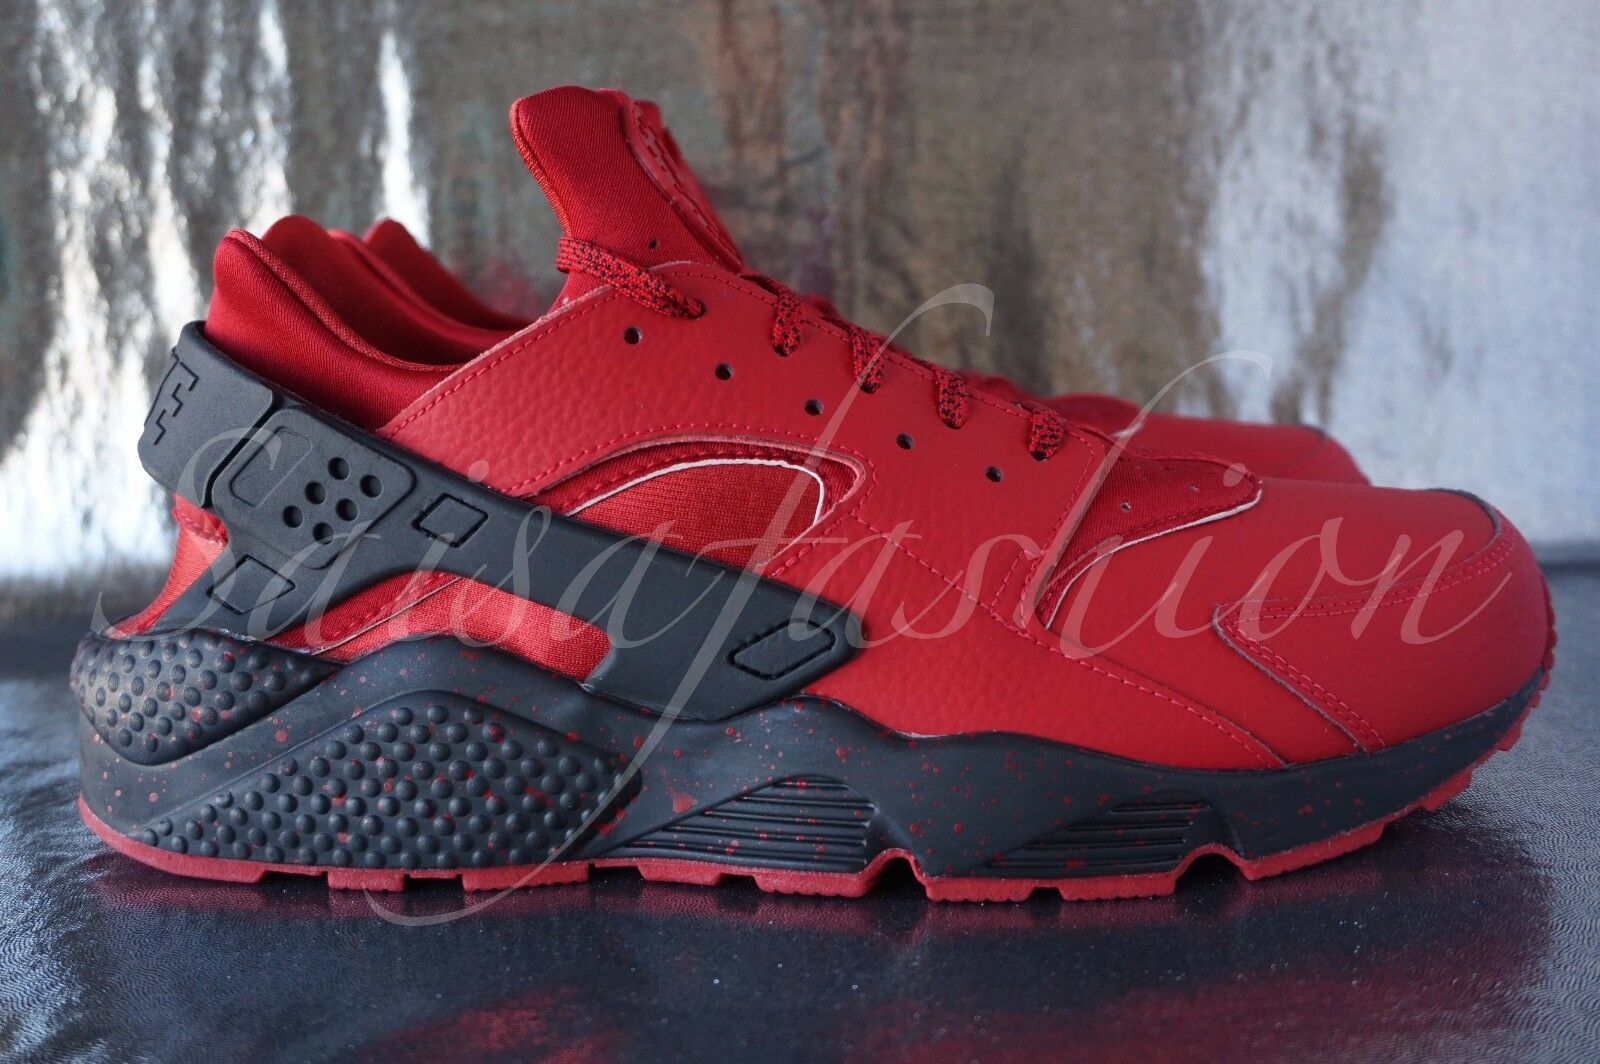 Nike Air Huarache Run iD NikeiD Leather Red October Men's 777330 985 Sz 12.5